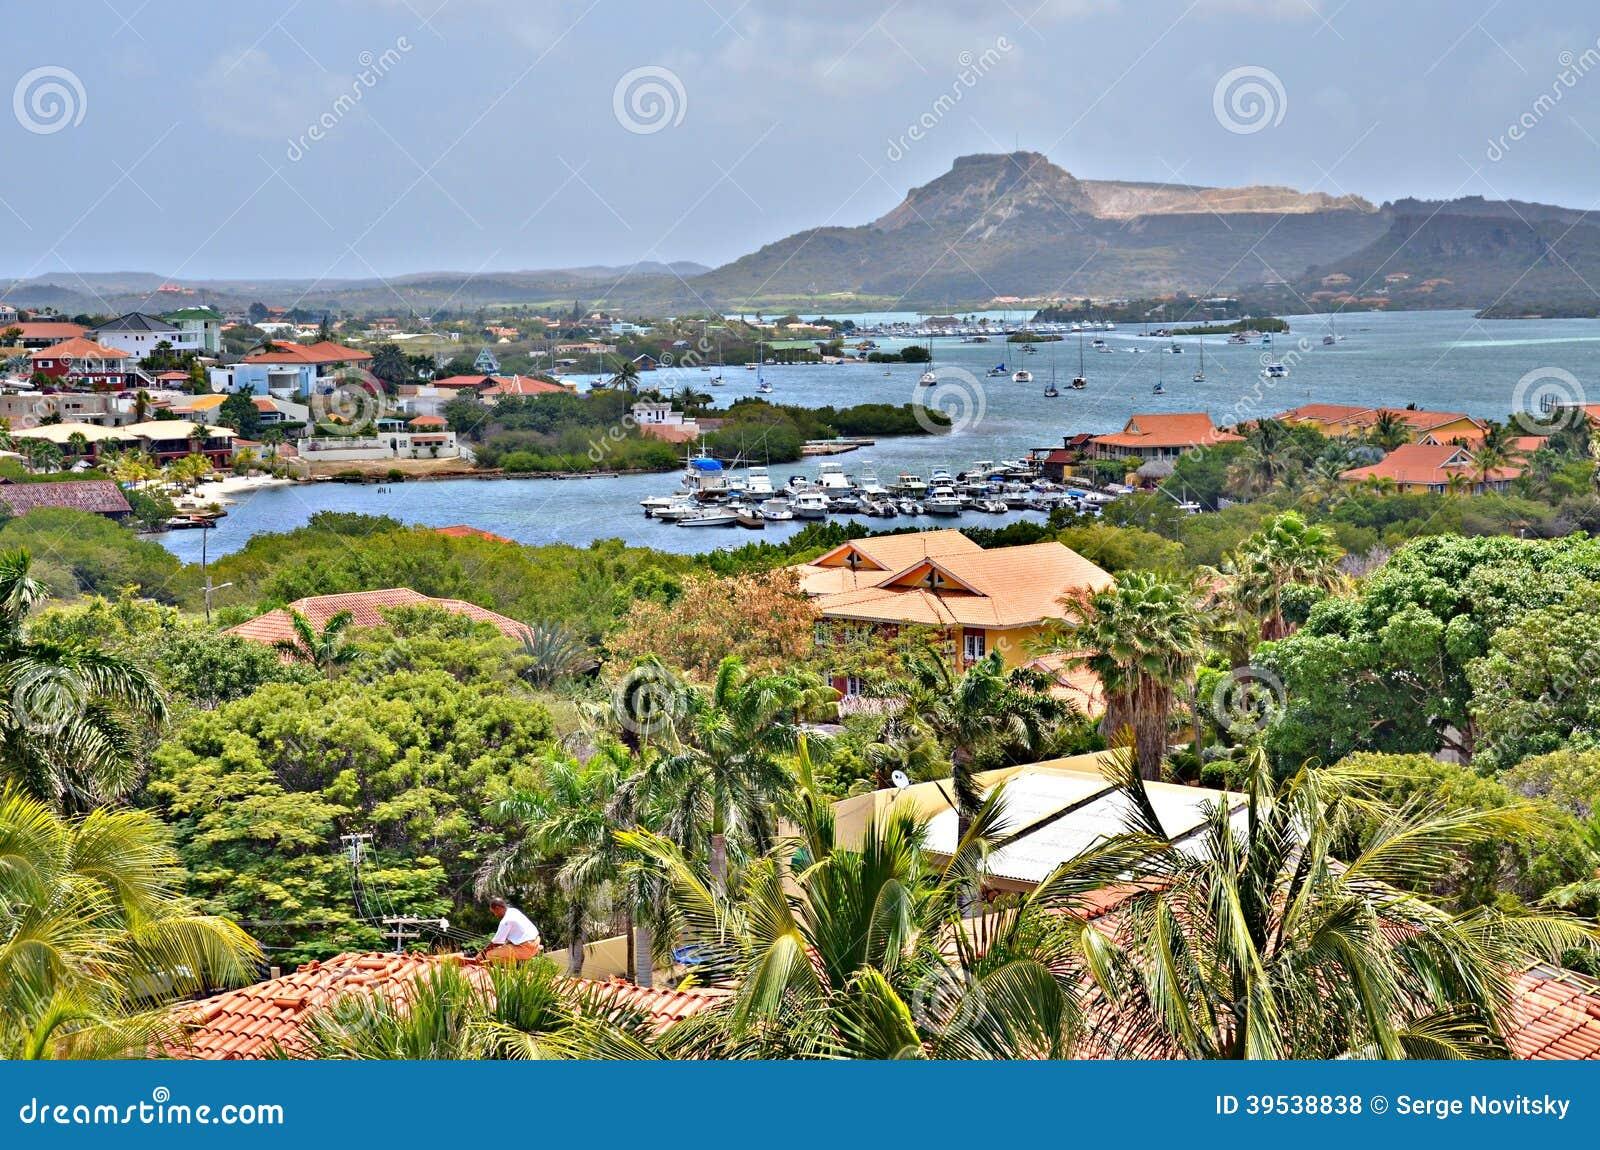 Willemstad Curaçao